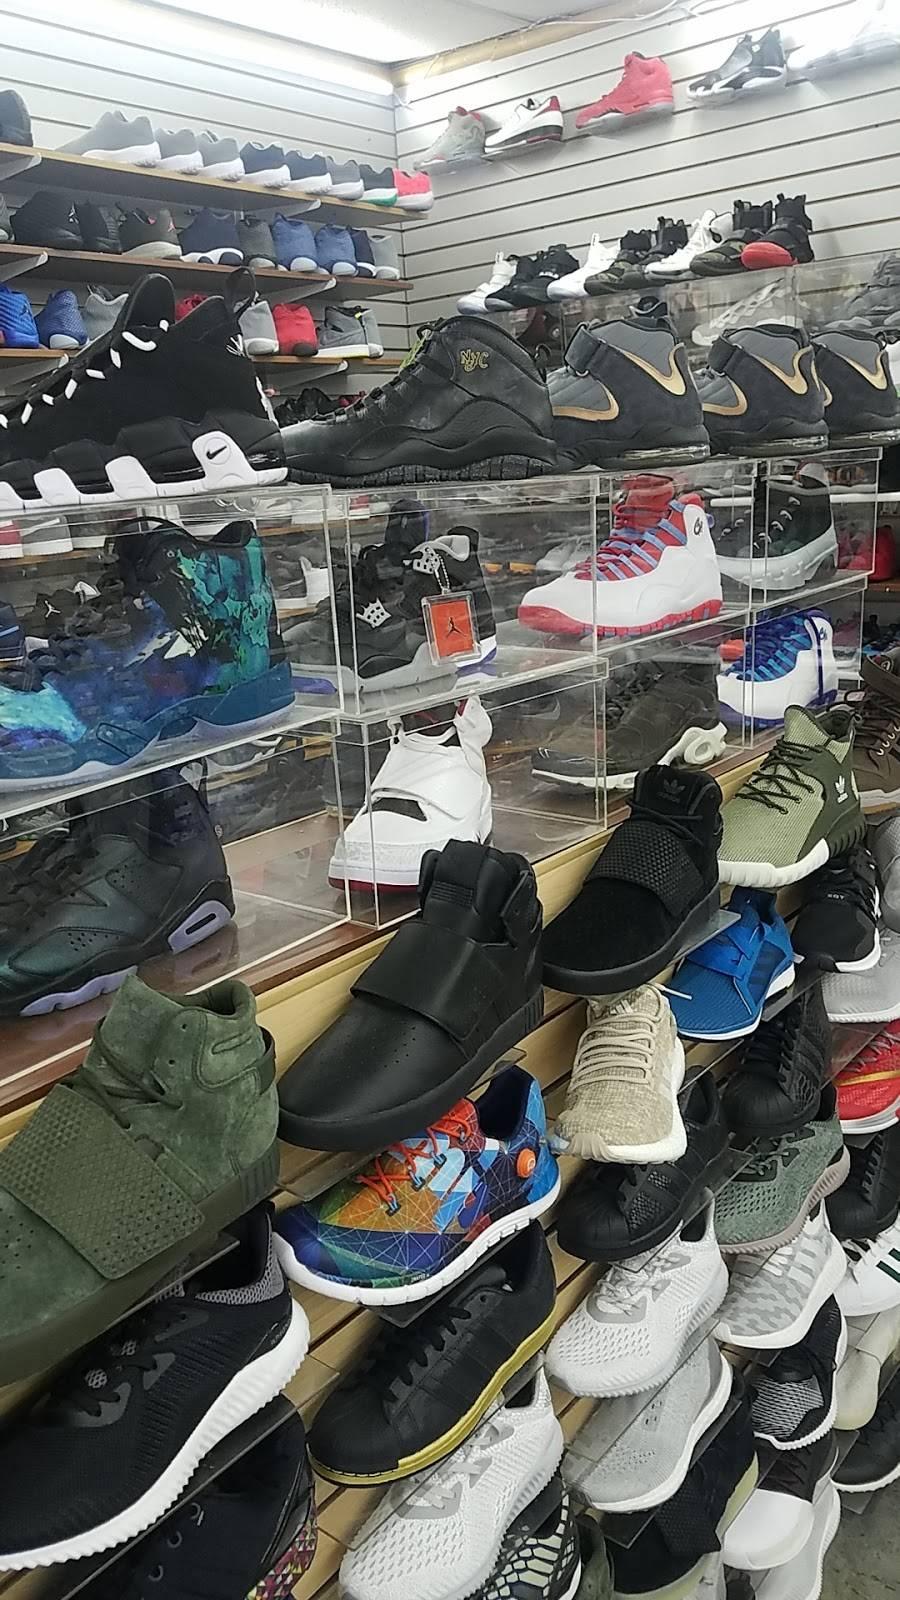 Outlet Shoes & Rugs - shoe store  | Photo 7 of 8 | Address: 221 E Ledbetter Dr, Dallas, TX 75216, USA | Phone: (214) 376-2959